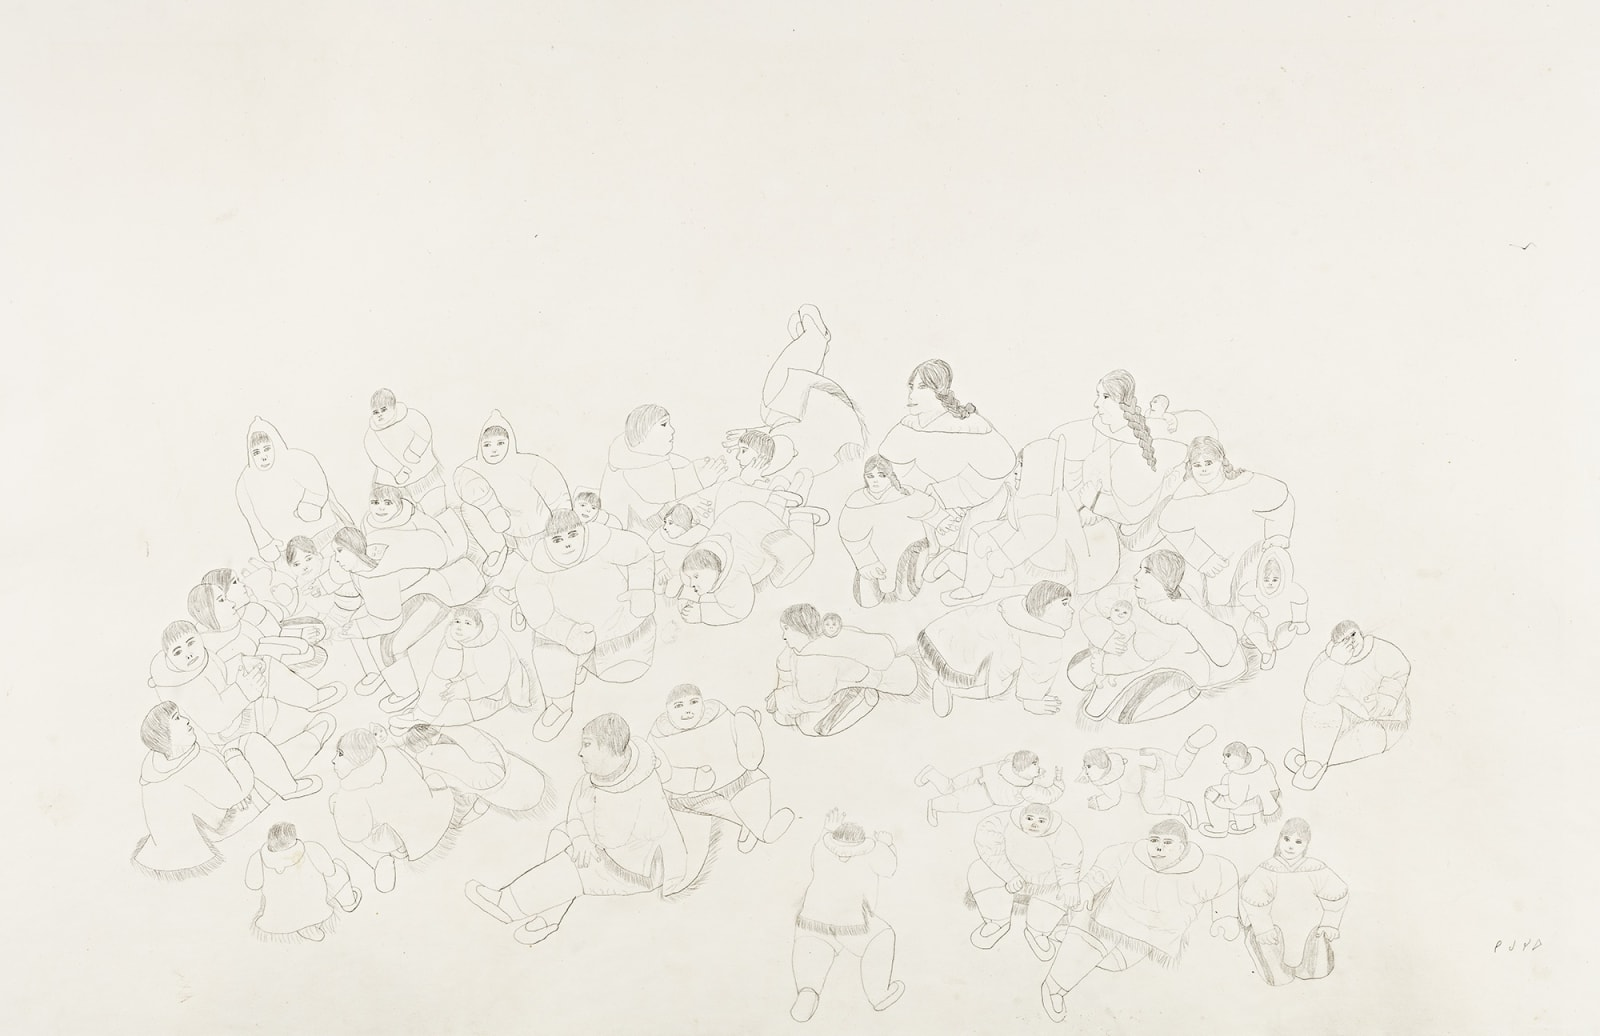 Lot 87 HANNAH KIGUSIUQ (1931-) BAKER LAKE (QAMANI'TUAQ) Community Gathering, mid 1970s graphite drawing, 26 x 40 in (66 x 101.6 cm) Estimate: $1,600— $2,400